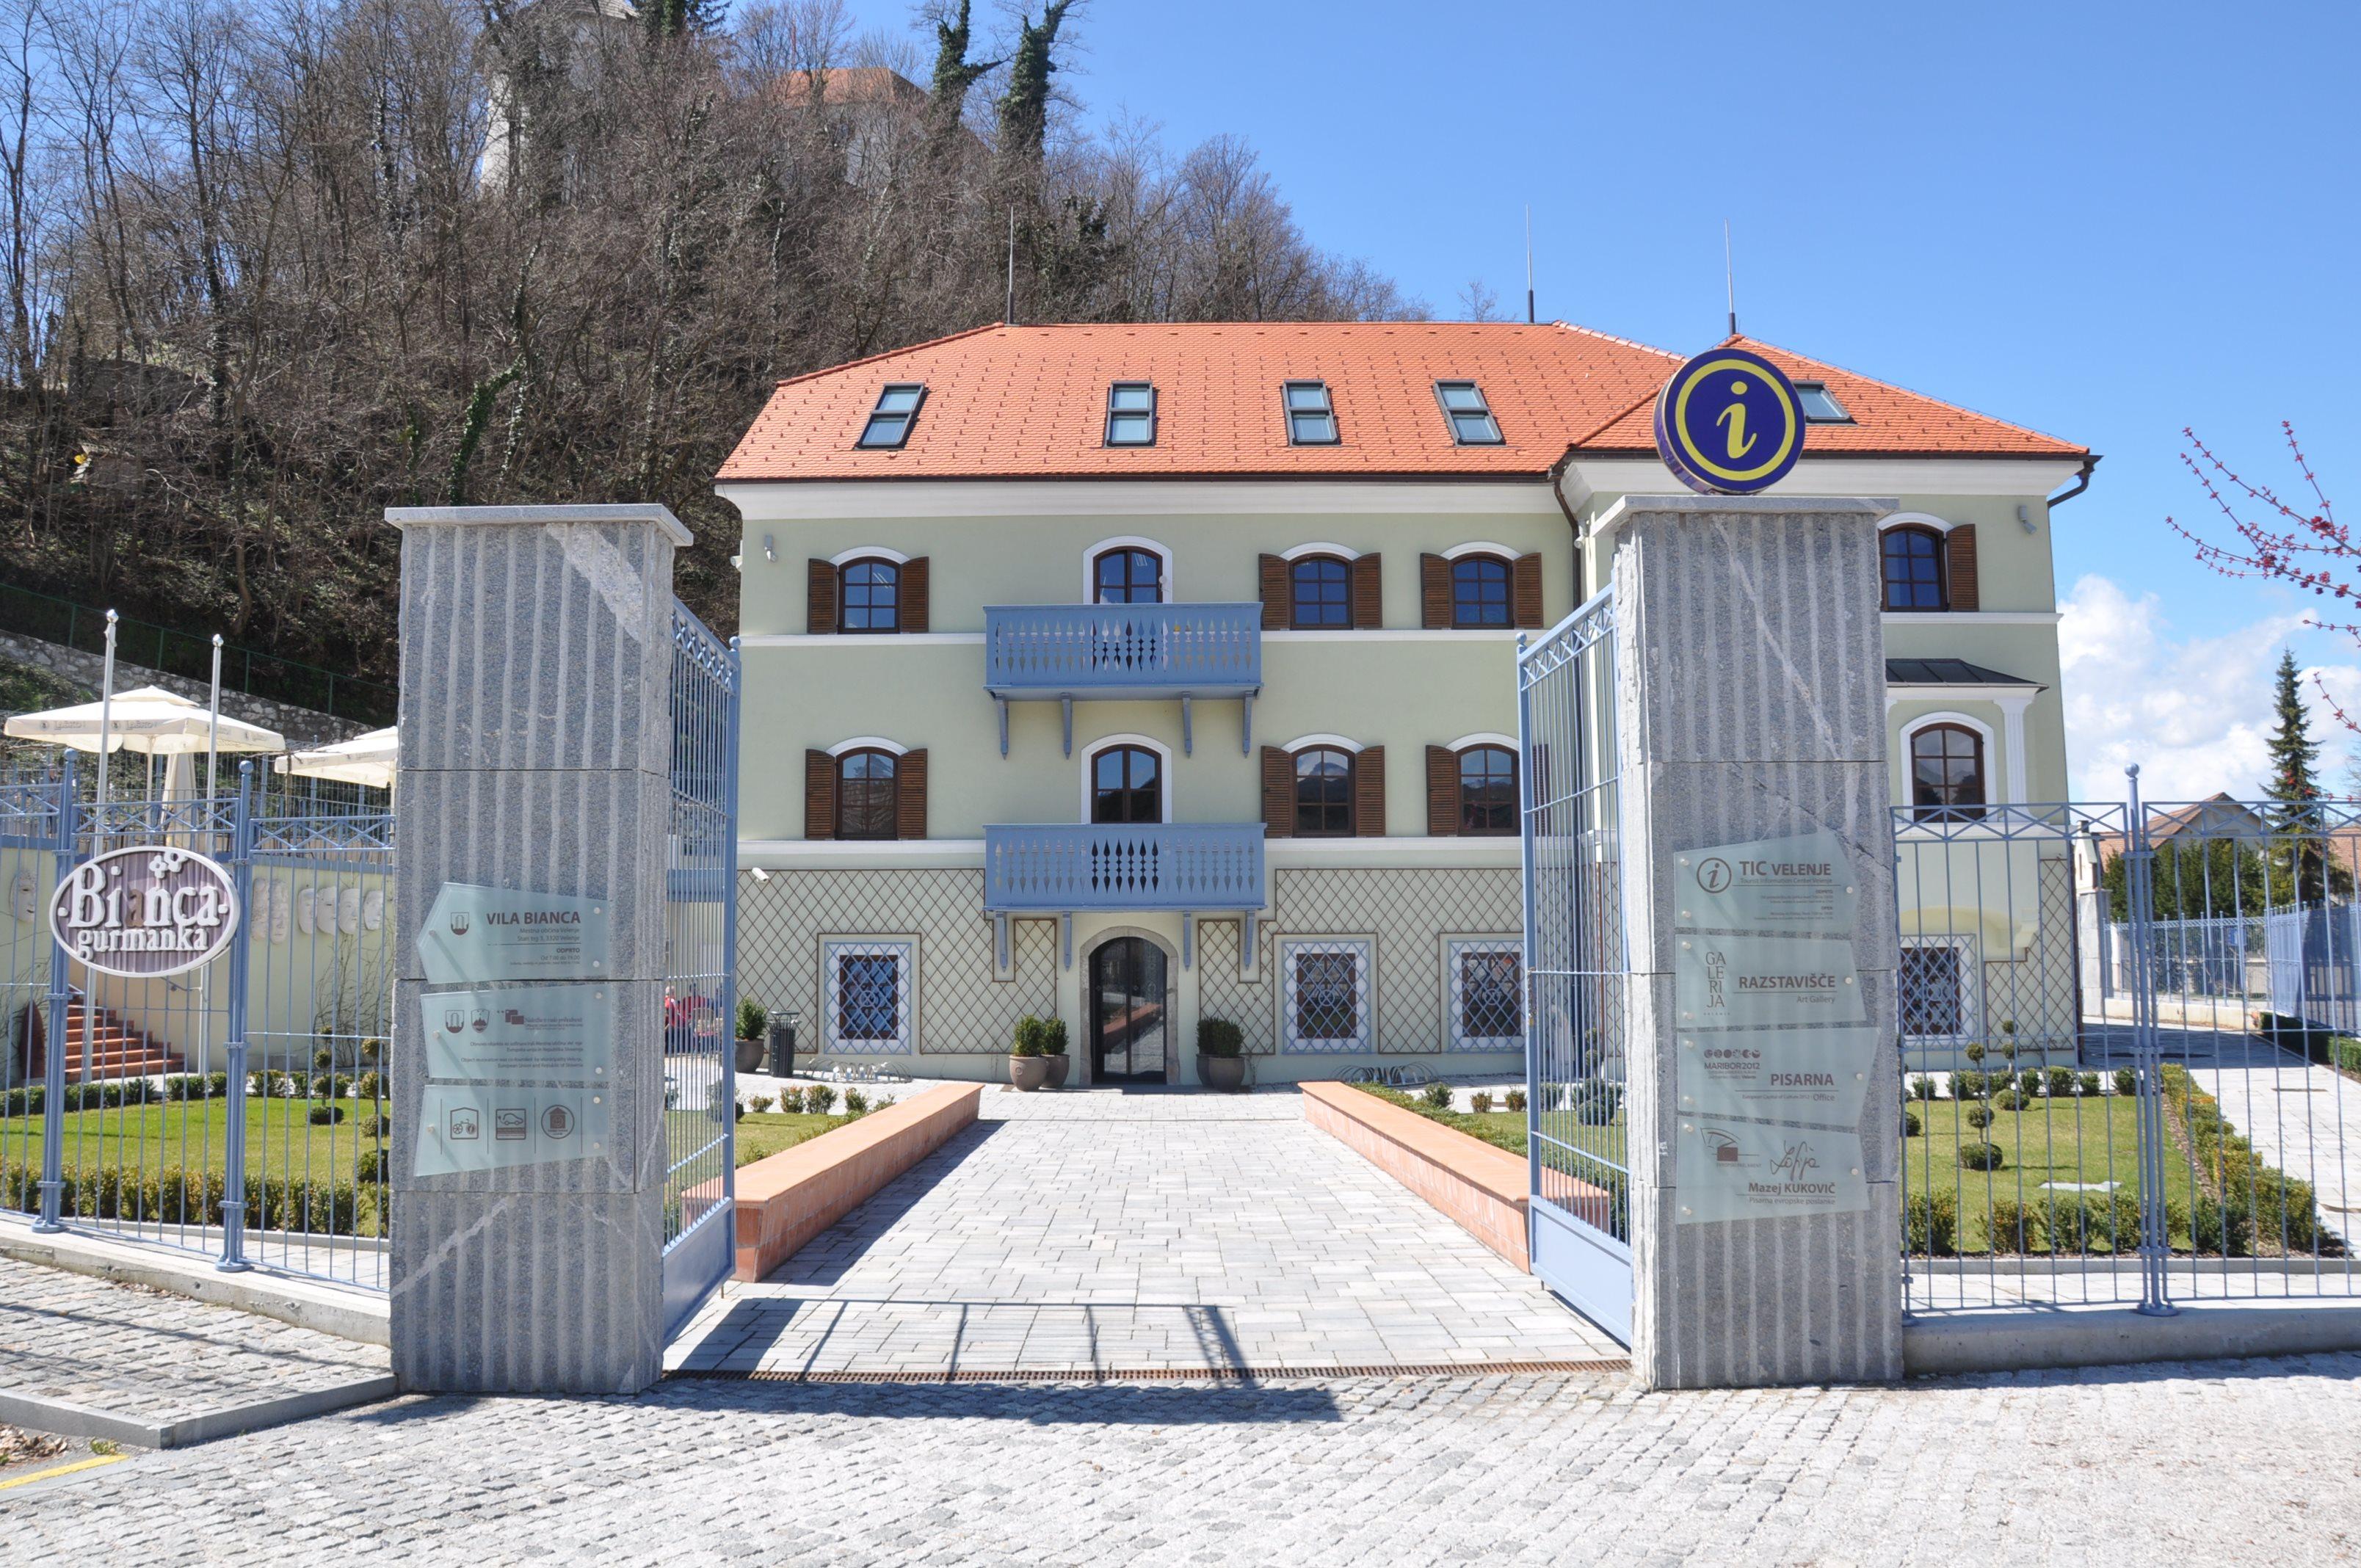 Vila Bianca